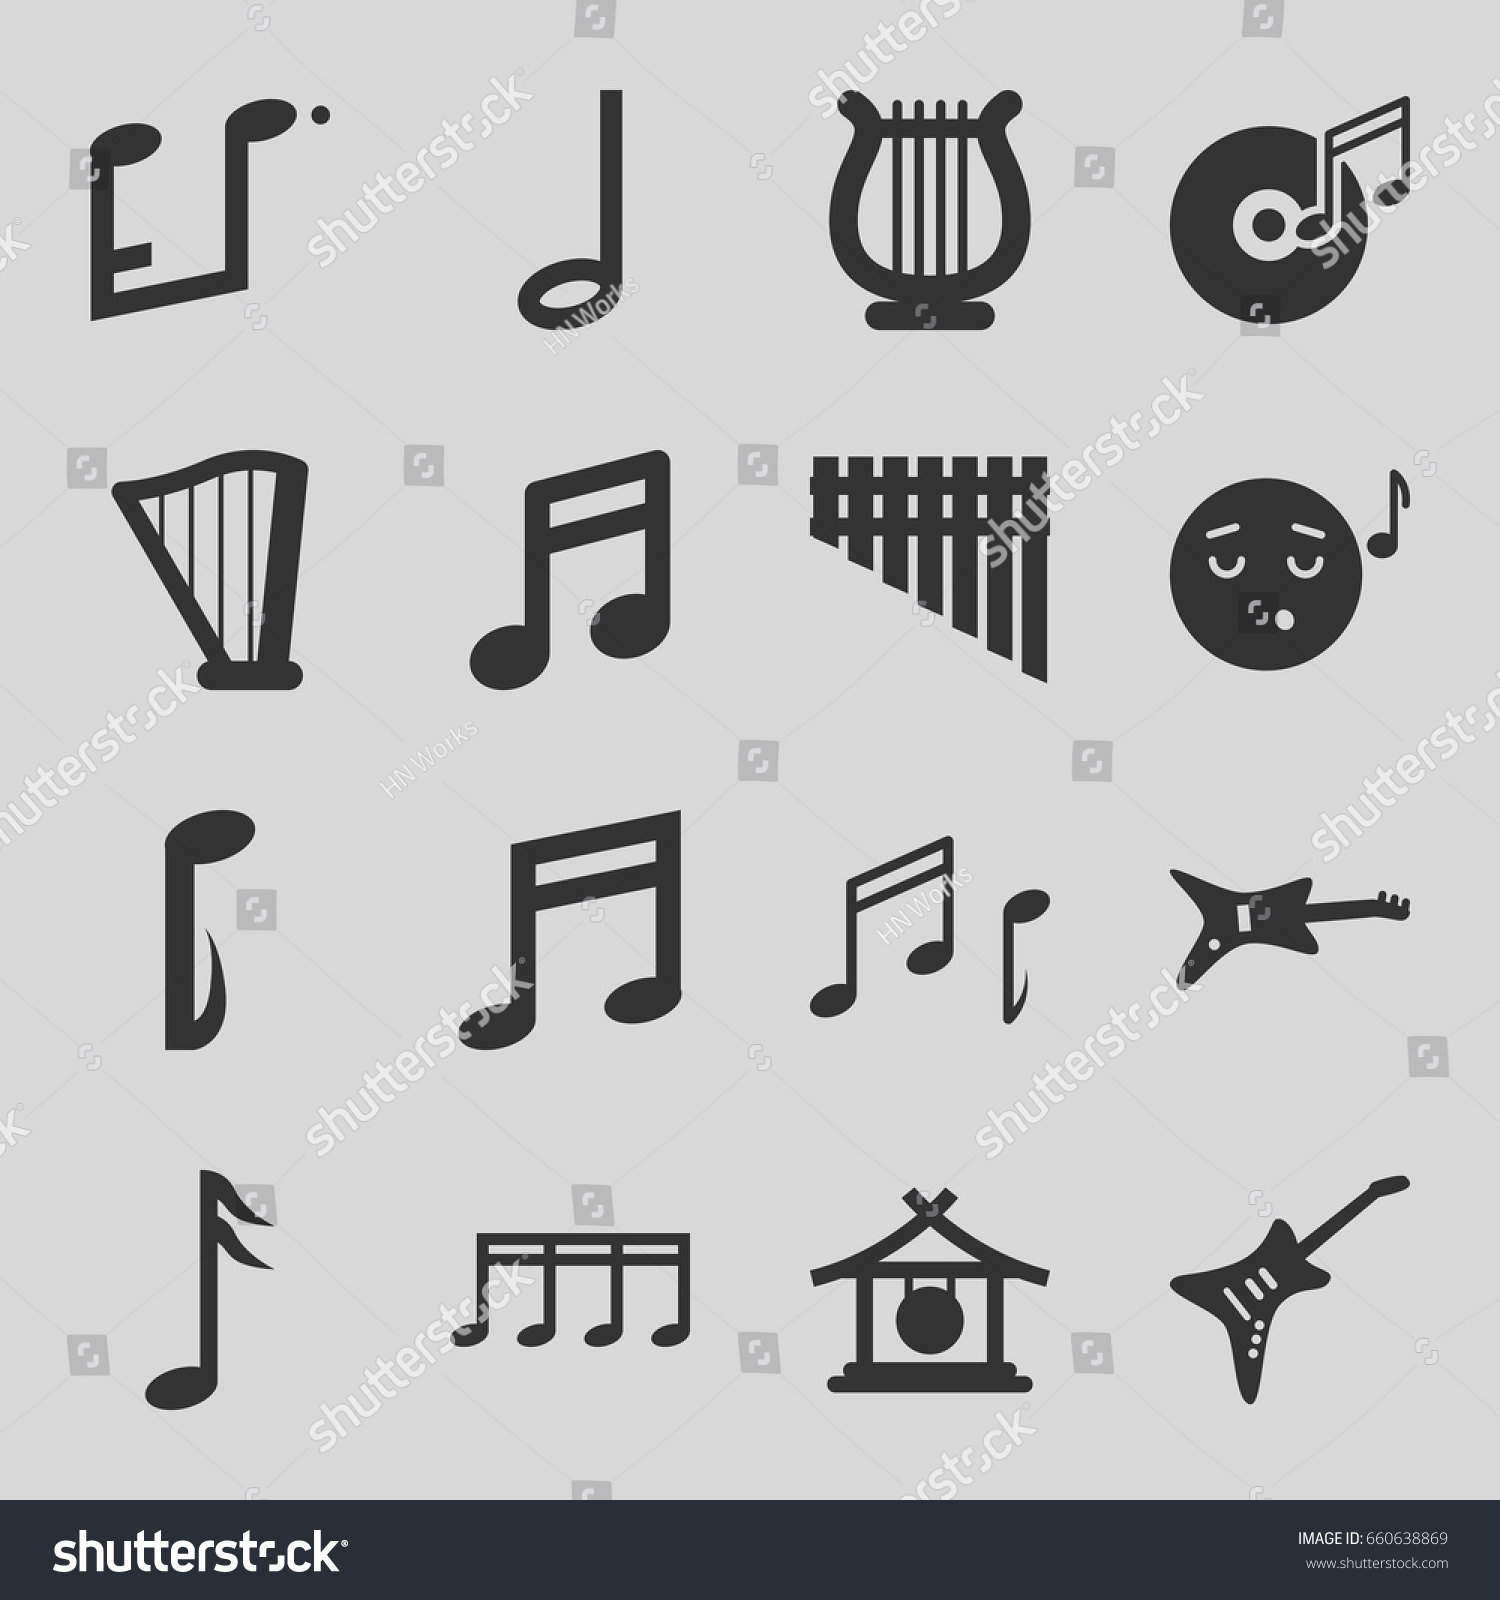 Airplane And Note Emoji